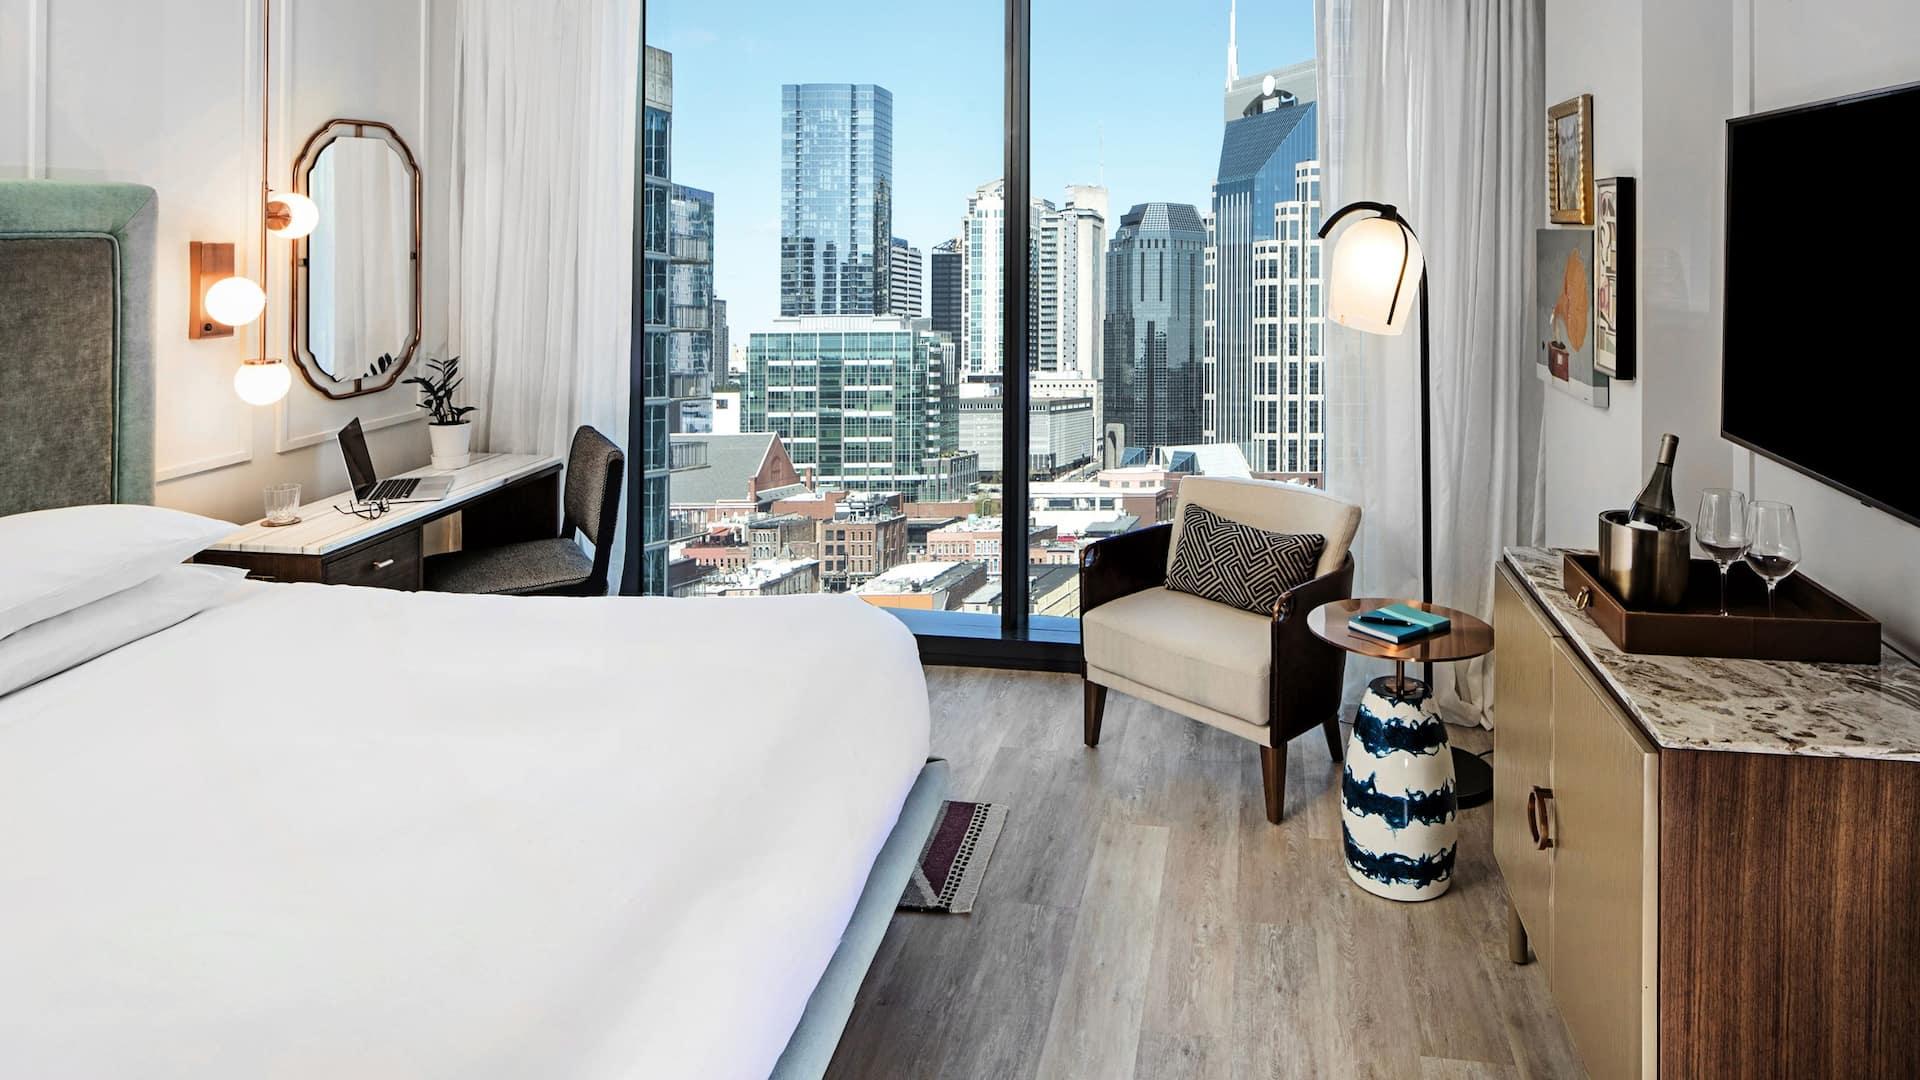 Luxury Nashville hotel suite near Music City Center